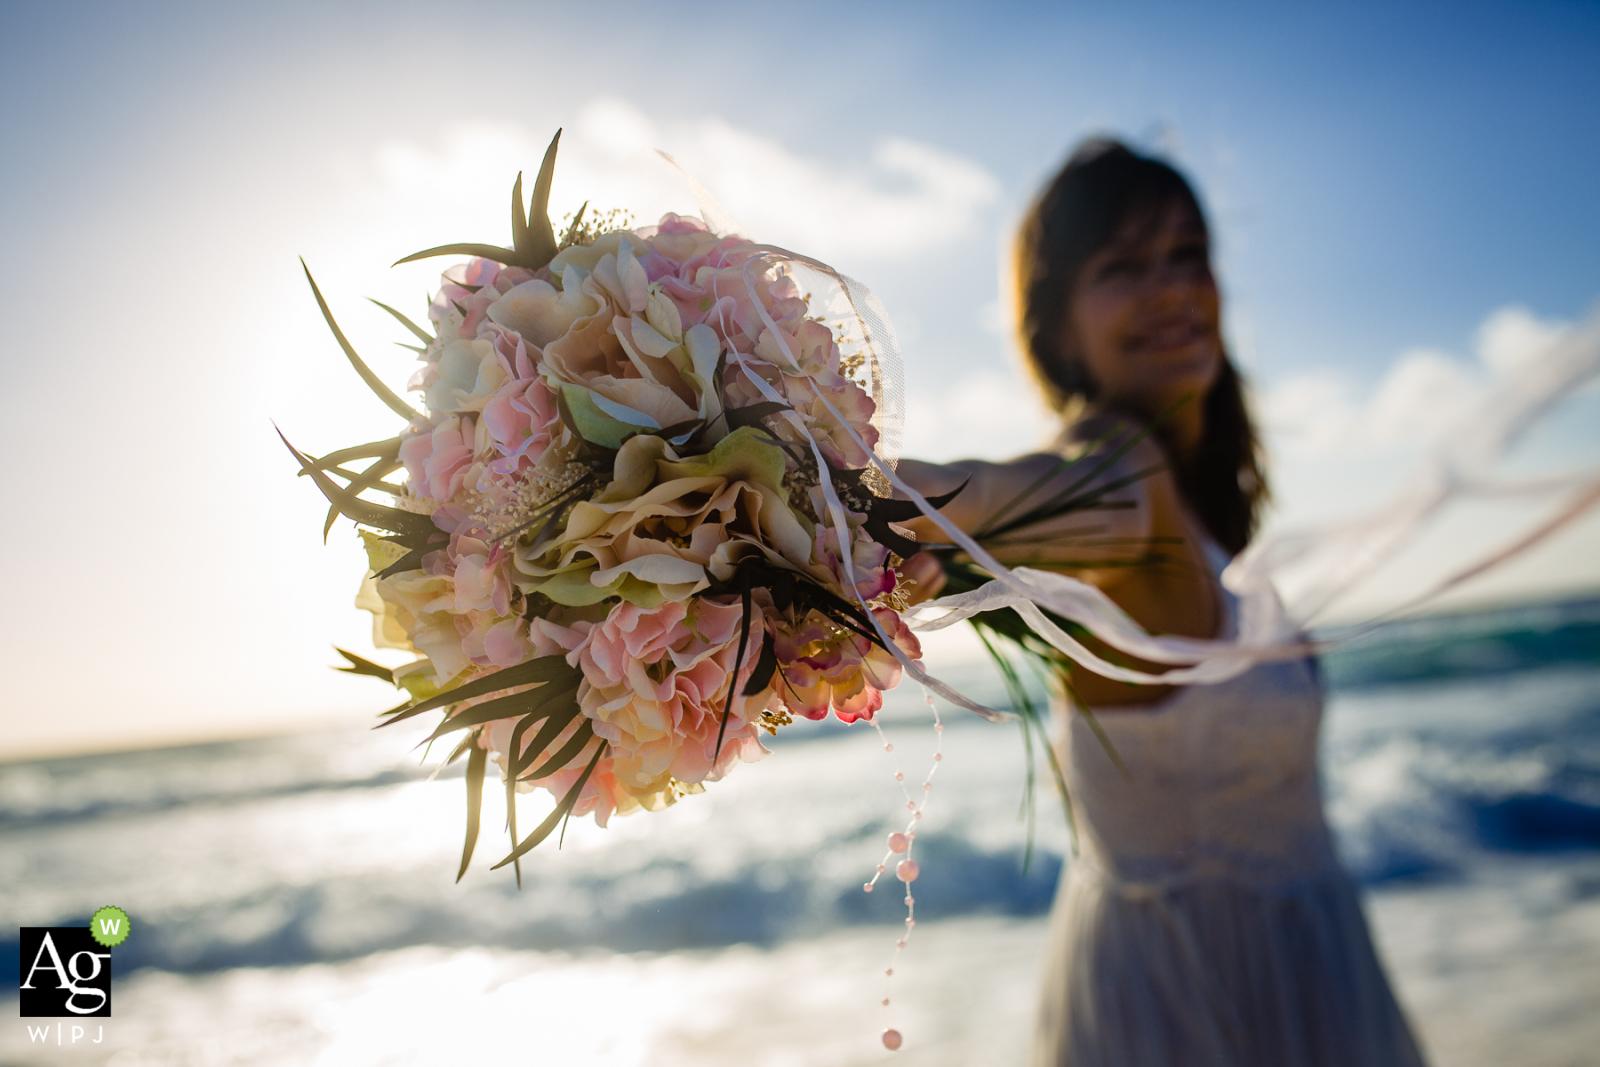 Alan Fresnel is an artistic wedding photographer for Quintana Roo